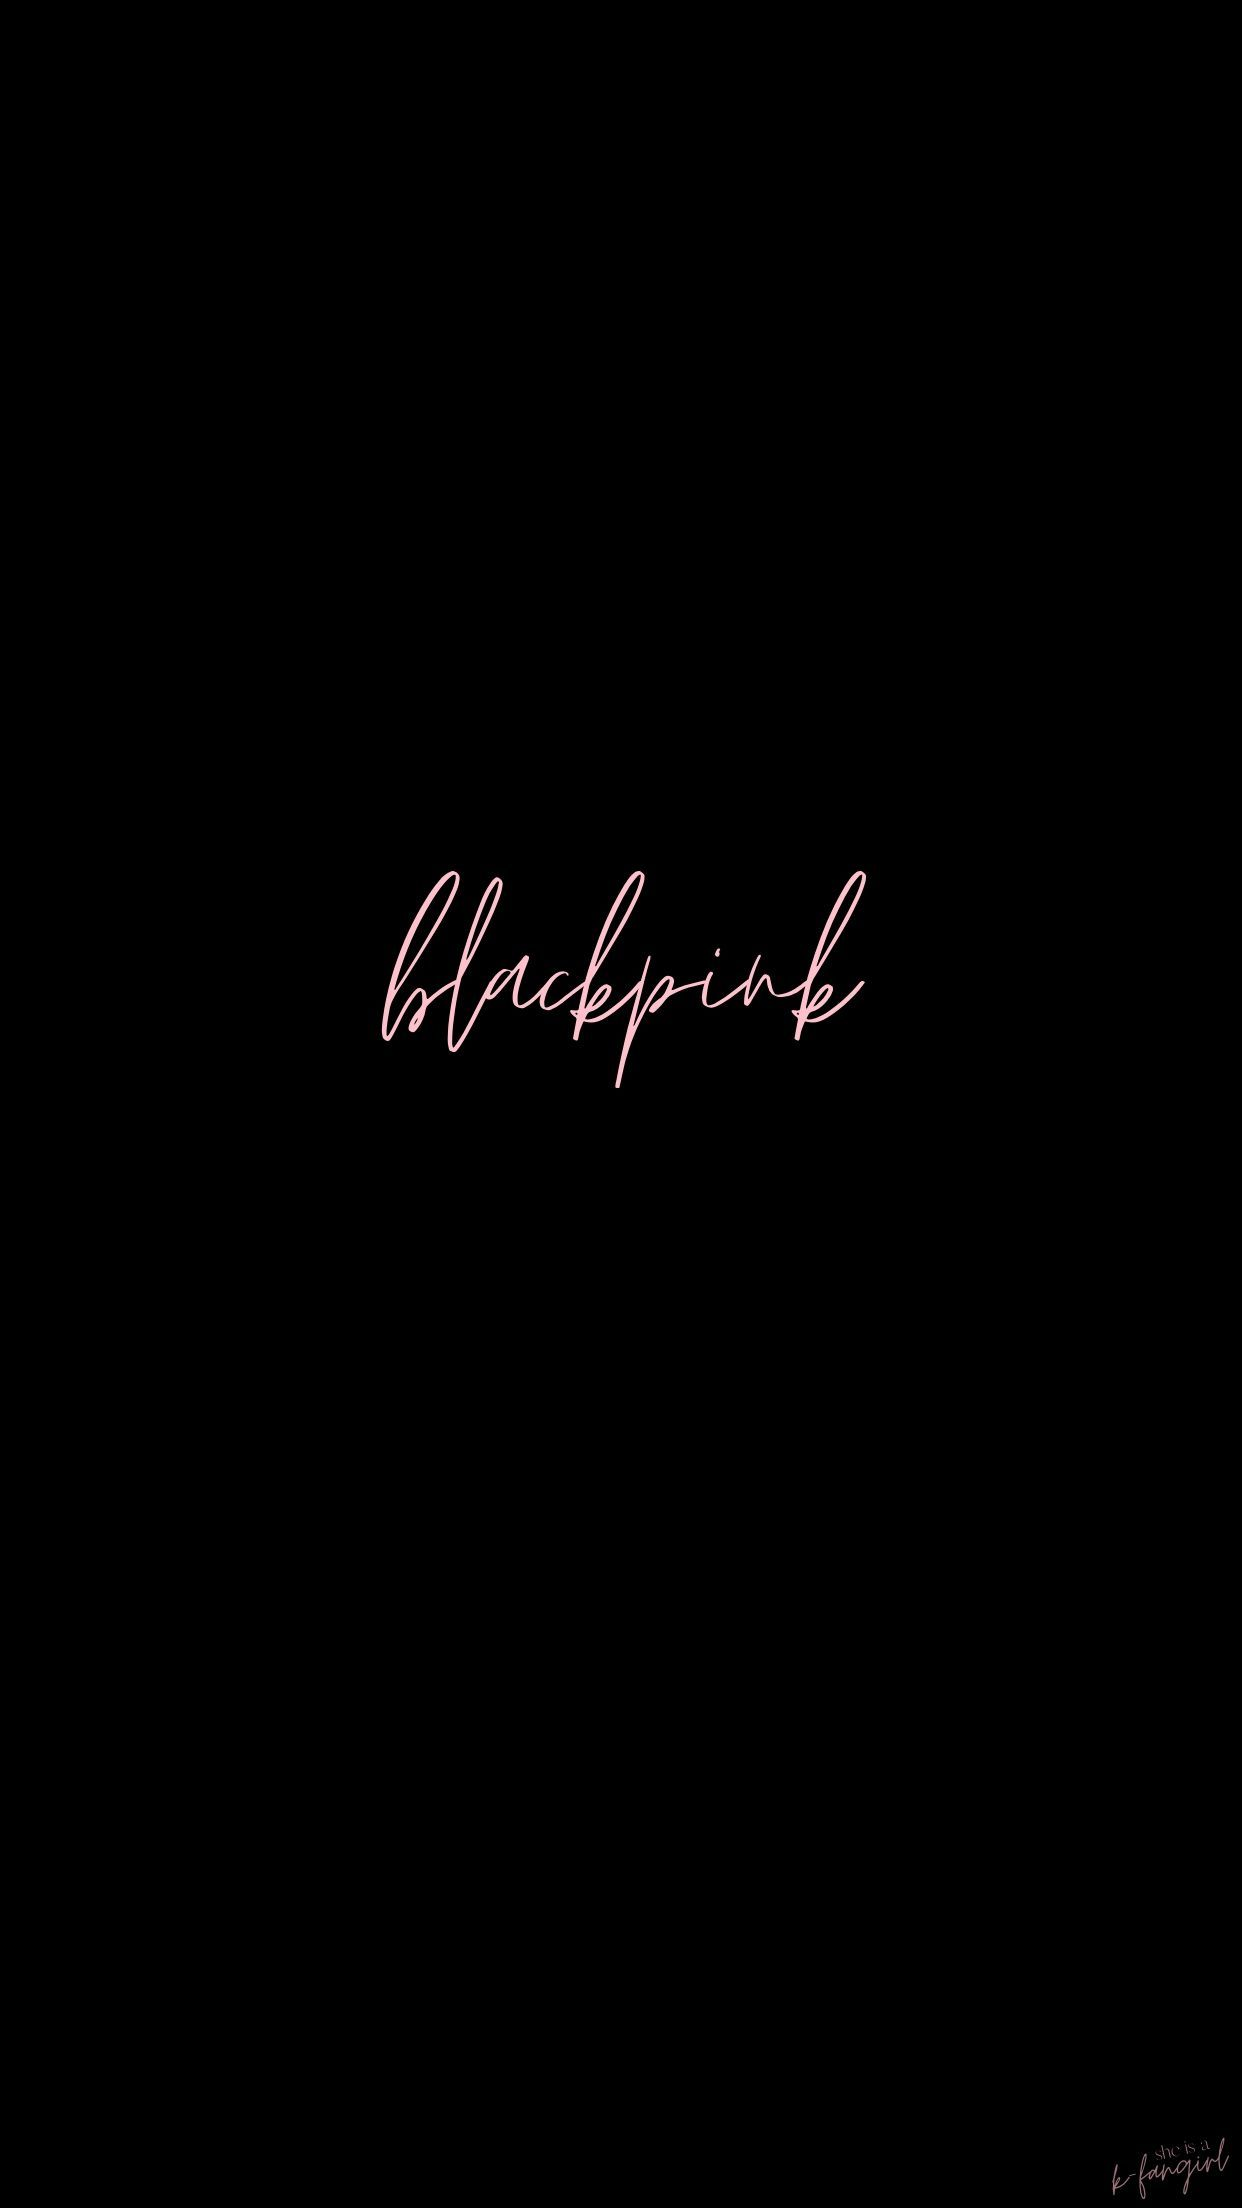 Blackpink Lockscreen In 2020 Blackpink Minimalist Wallpaper Blackpink Photos